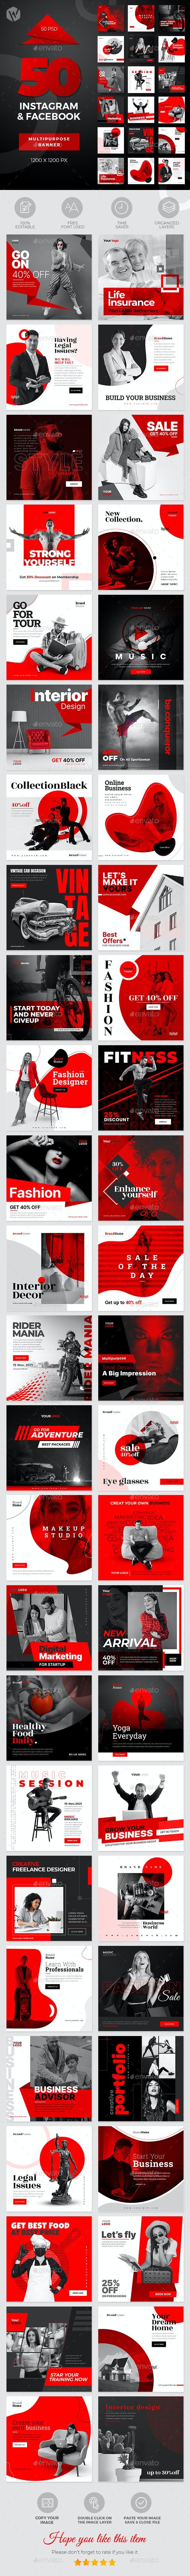 50 Instagram & Facebook Banners - Social Media Web Elements